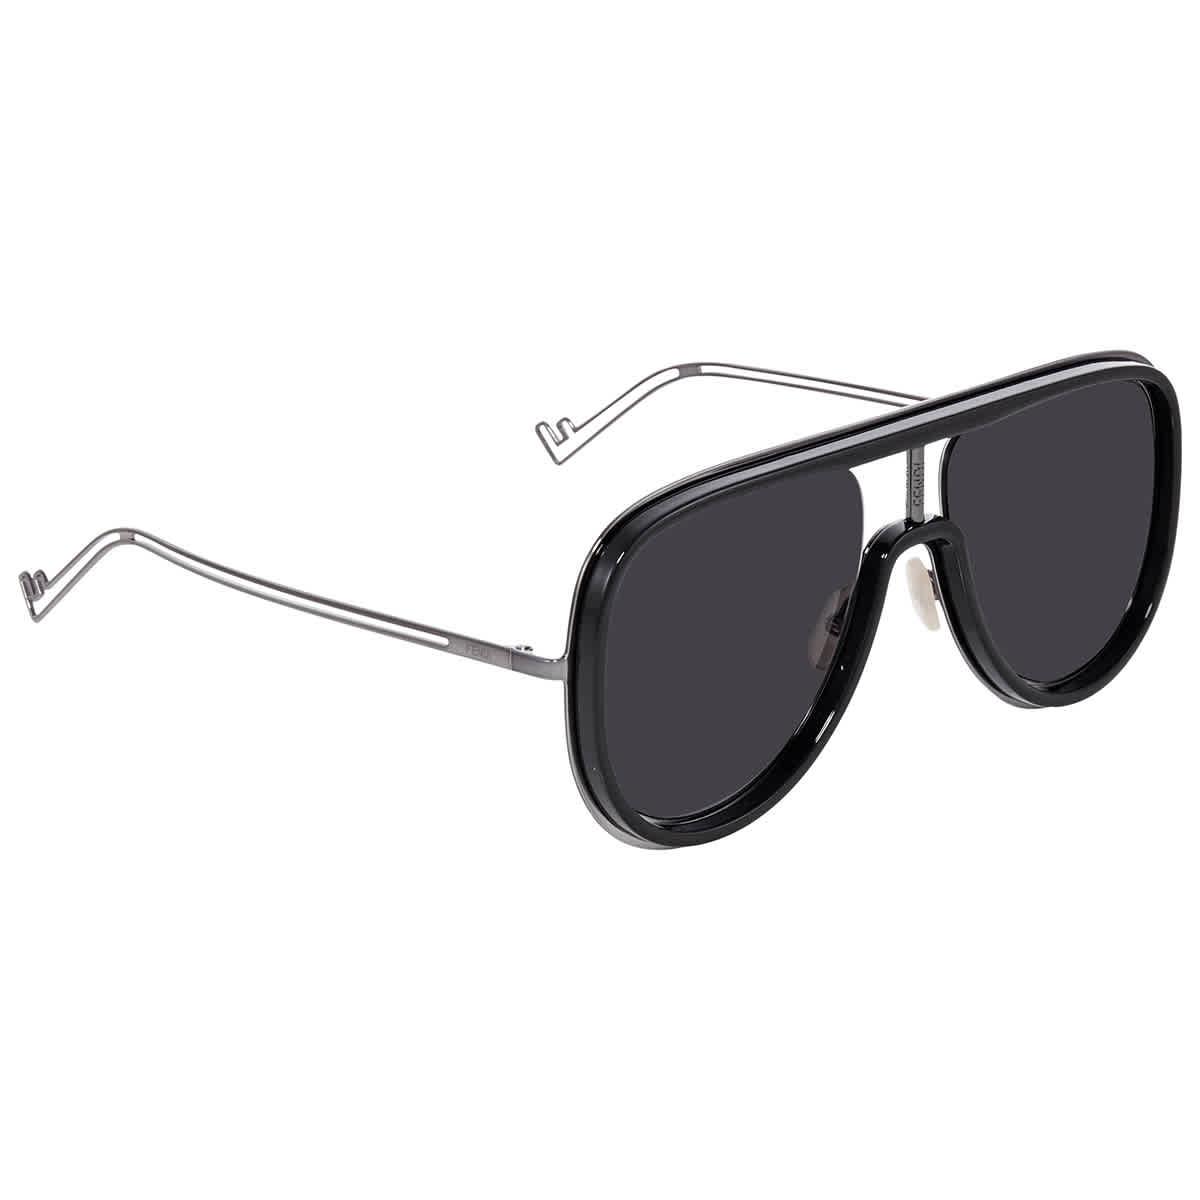 Fendi Grey Mens Sunglasses Ff M0068/s Ans 57 In Black,grey